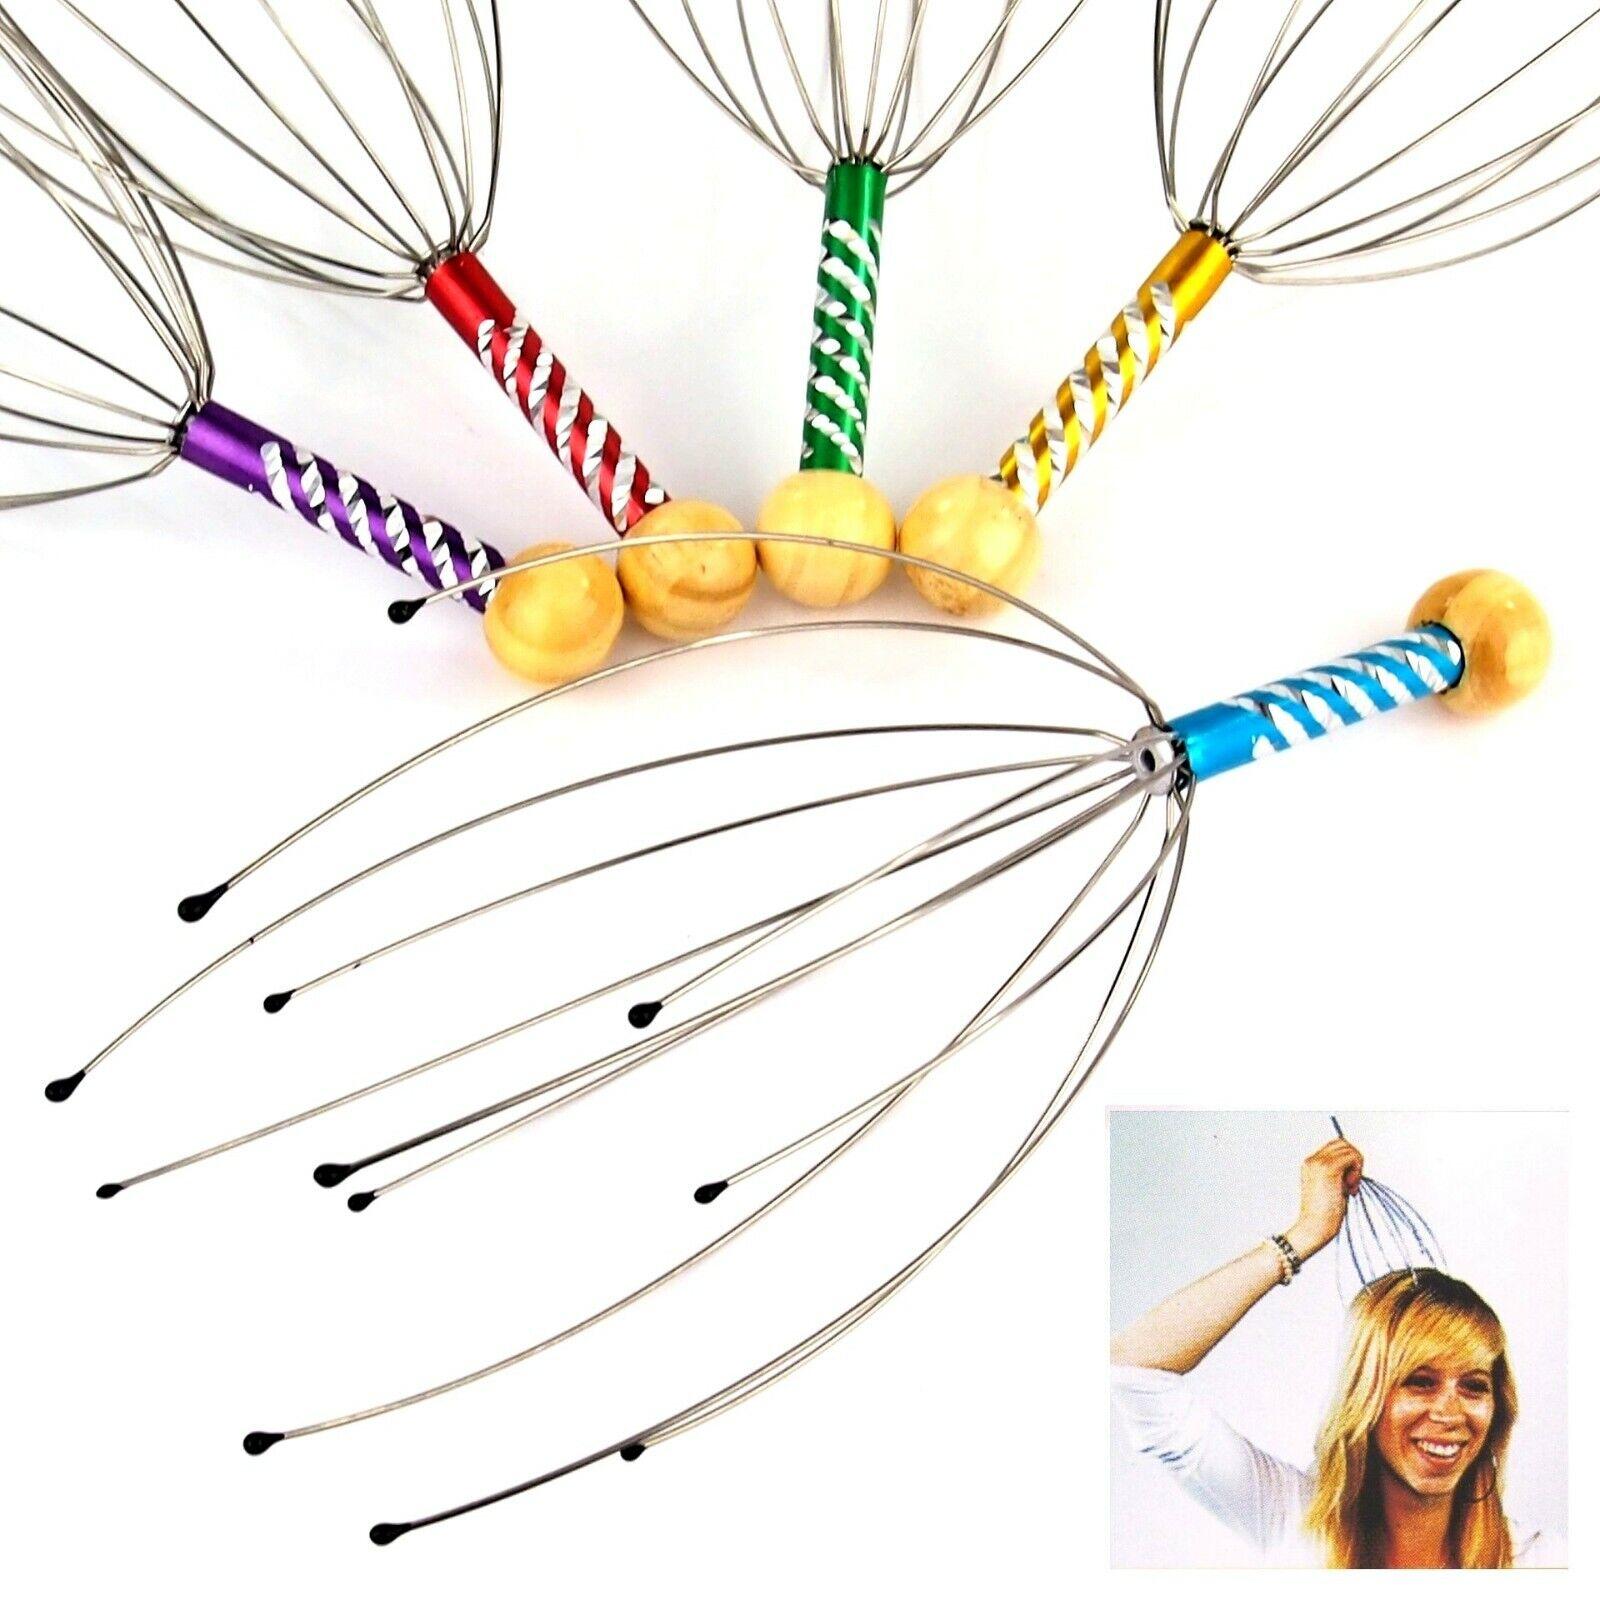 Premium Kopfmassagegerät Kopfmassage Massage Kopfkrauler Wellness Entspannung